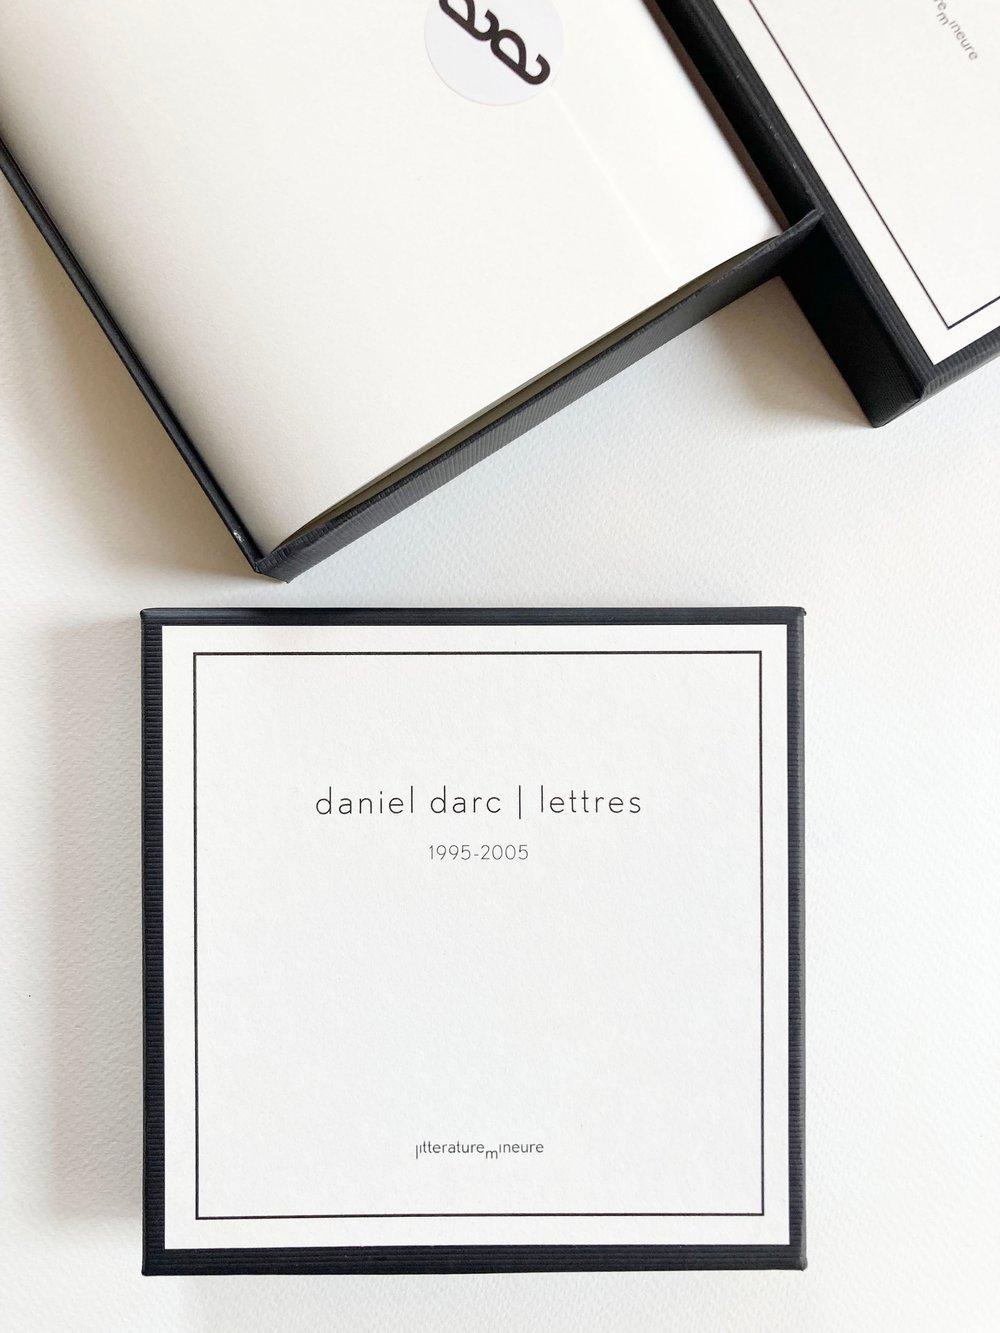 Image of D. DARC